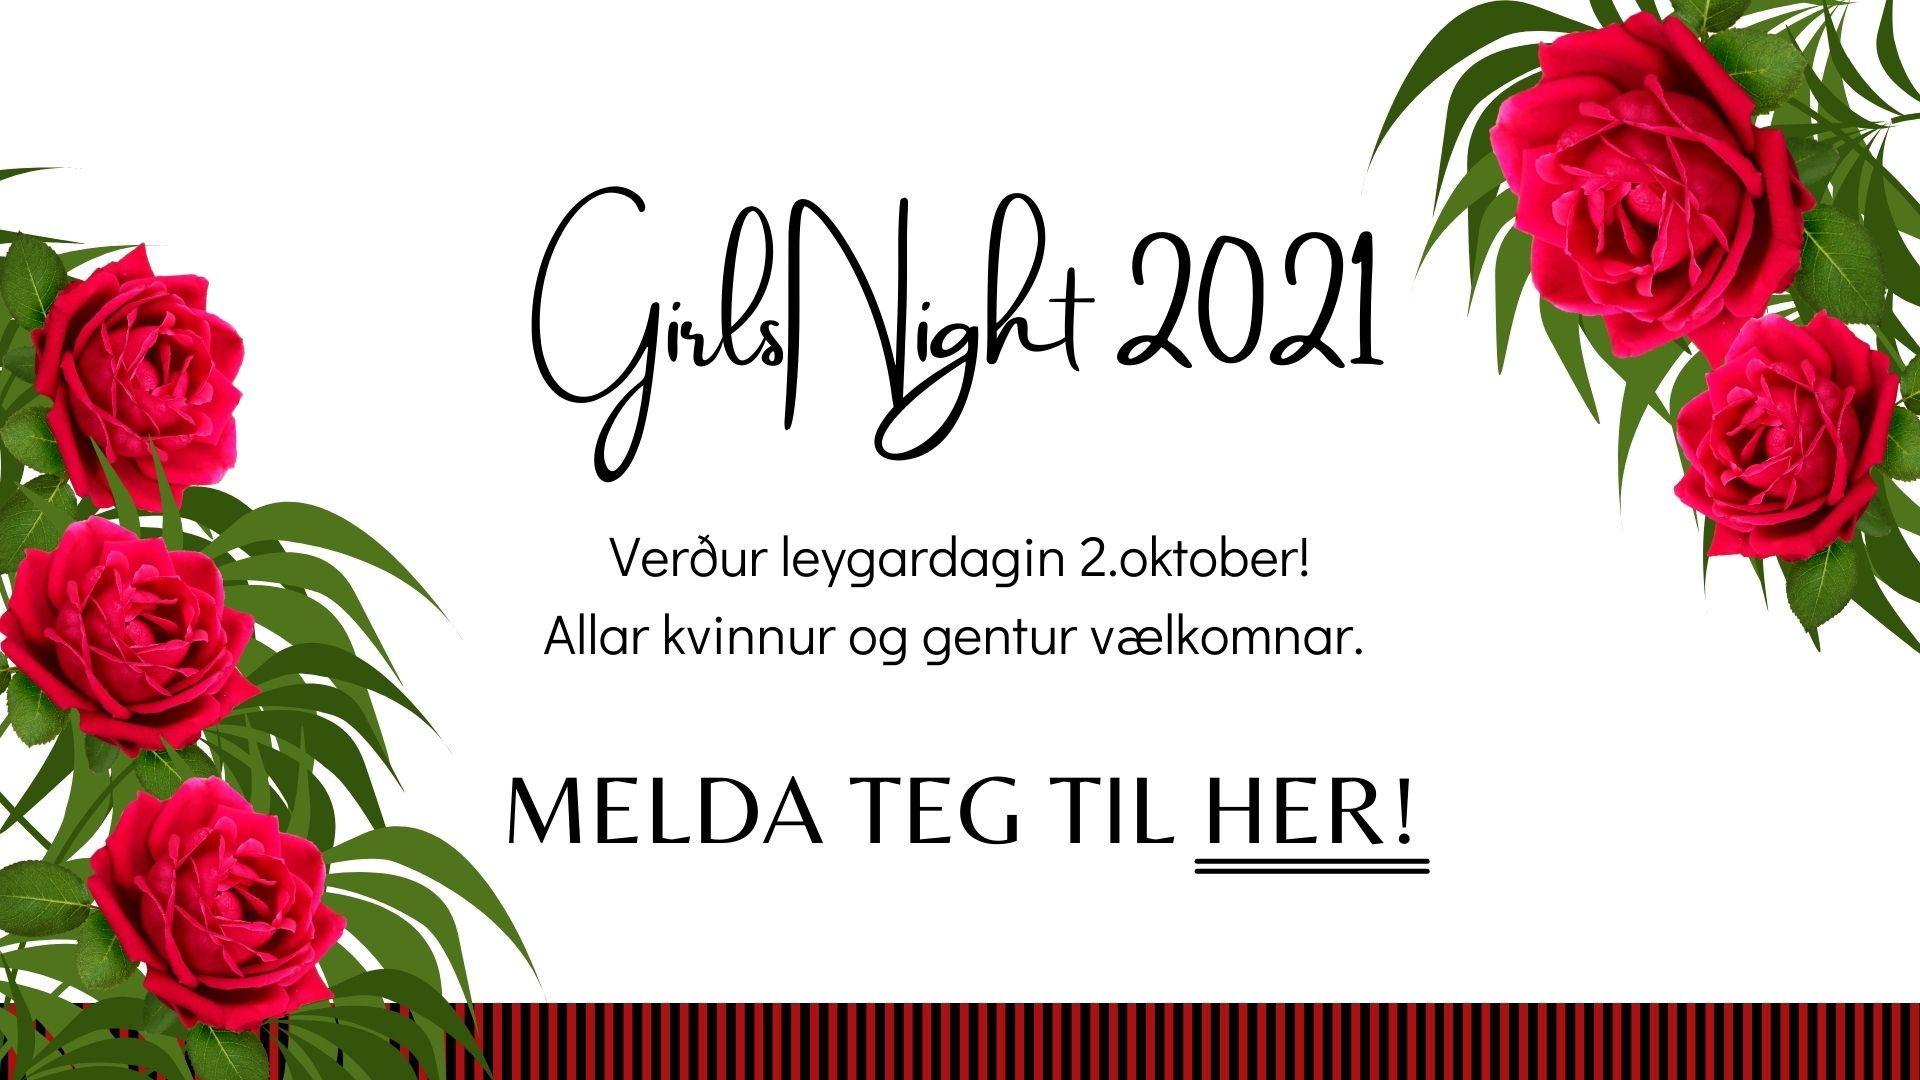 Girls Night 2021